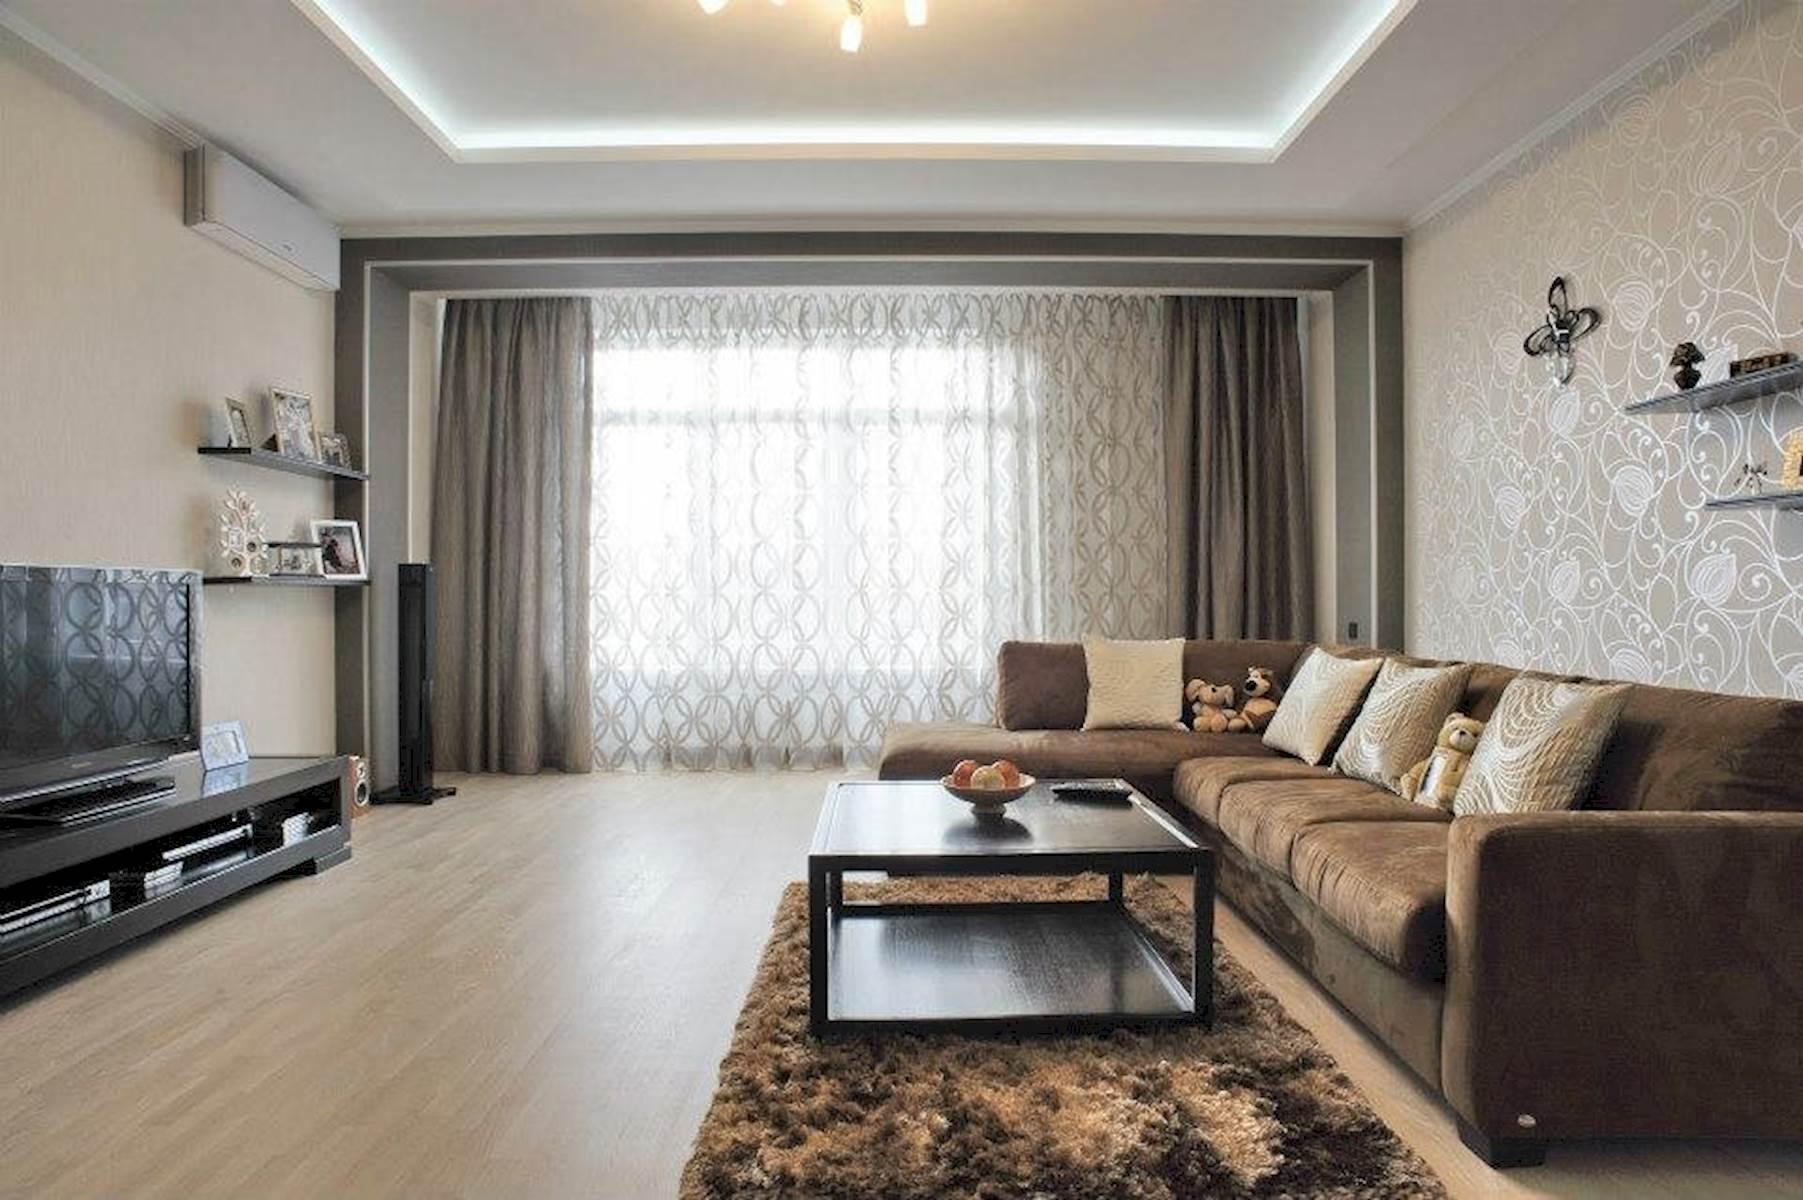 дизайн интерьера квартиры фото 50 кв.м